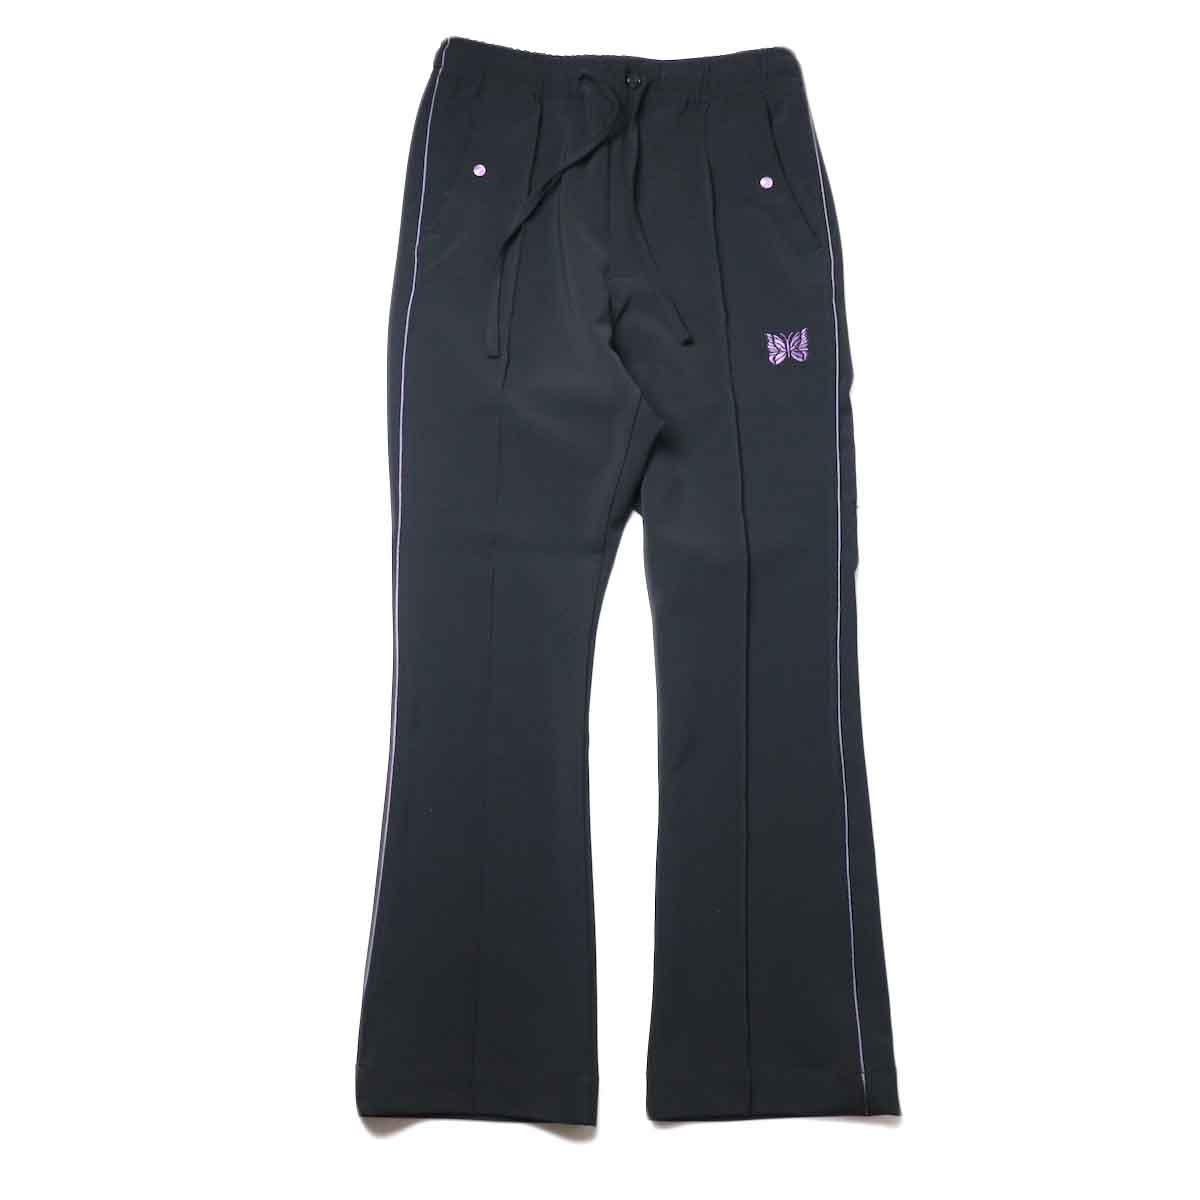 Needles / PIPING COWBOY PANT - PE/PU DOUBLE CLOTH (Black)正面